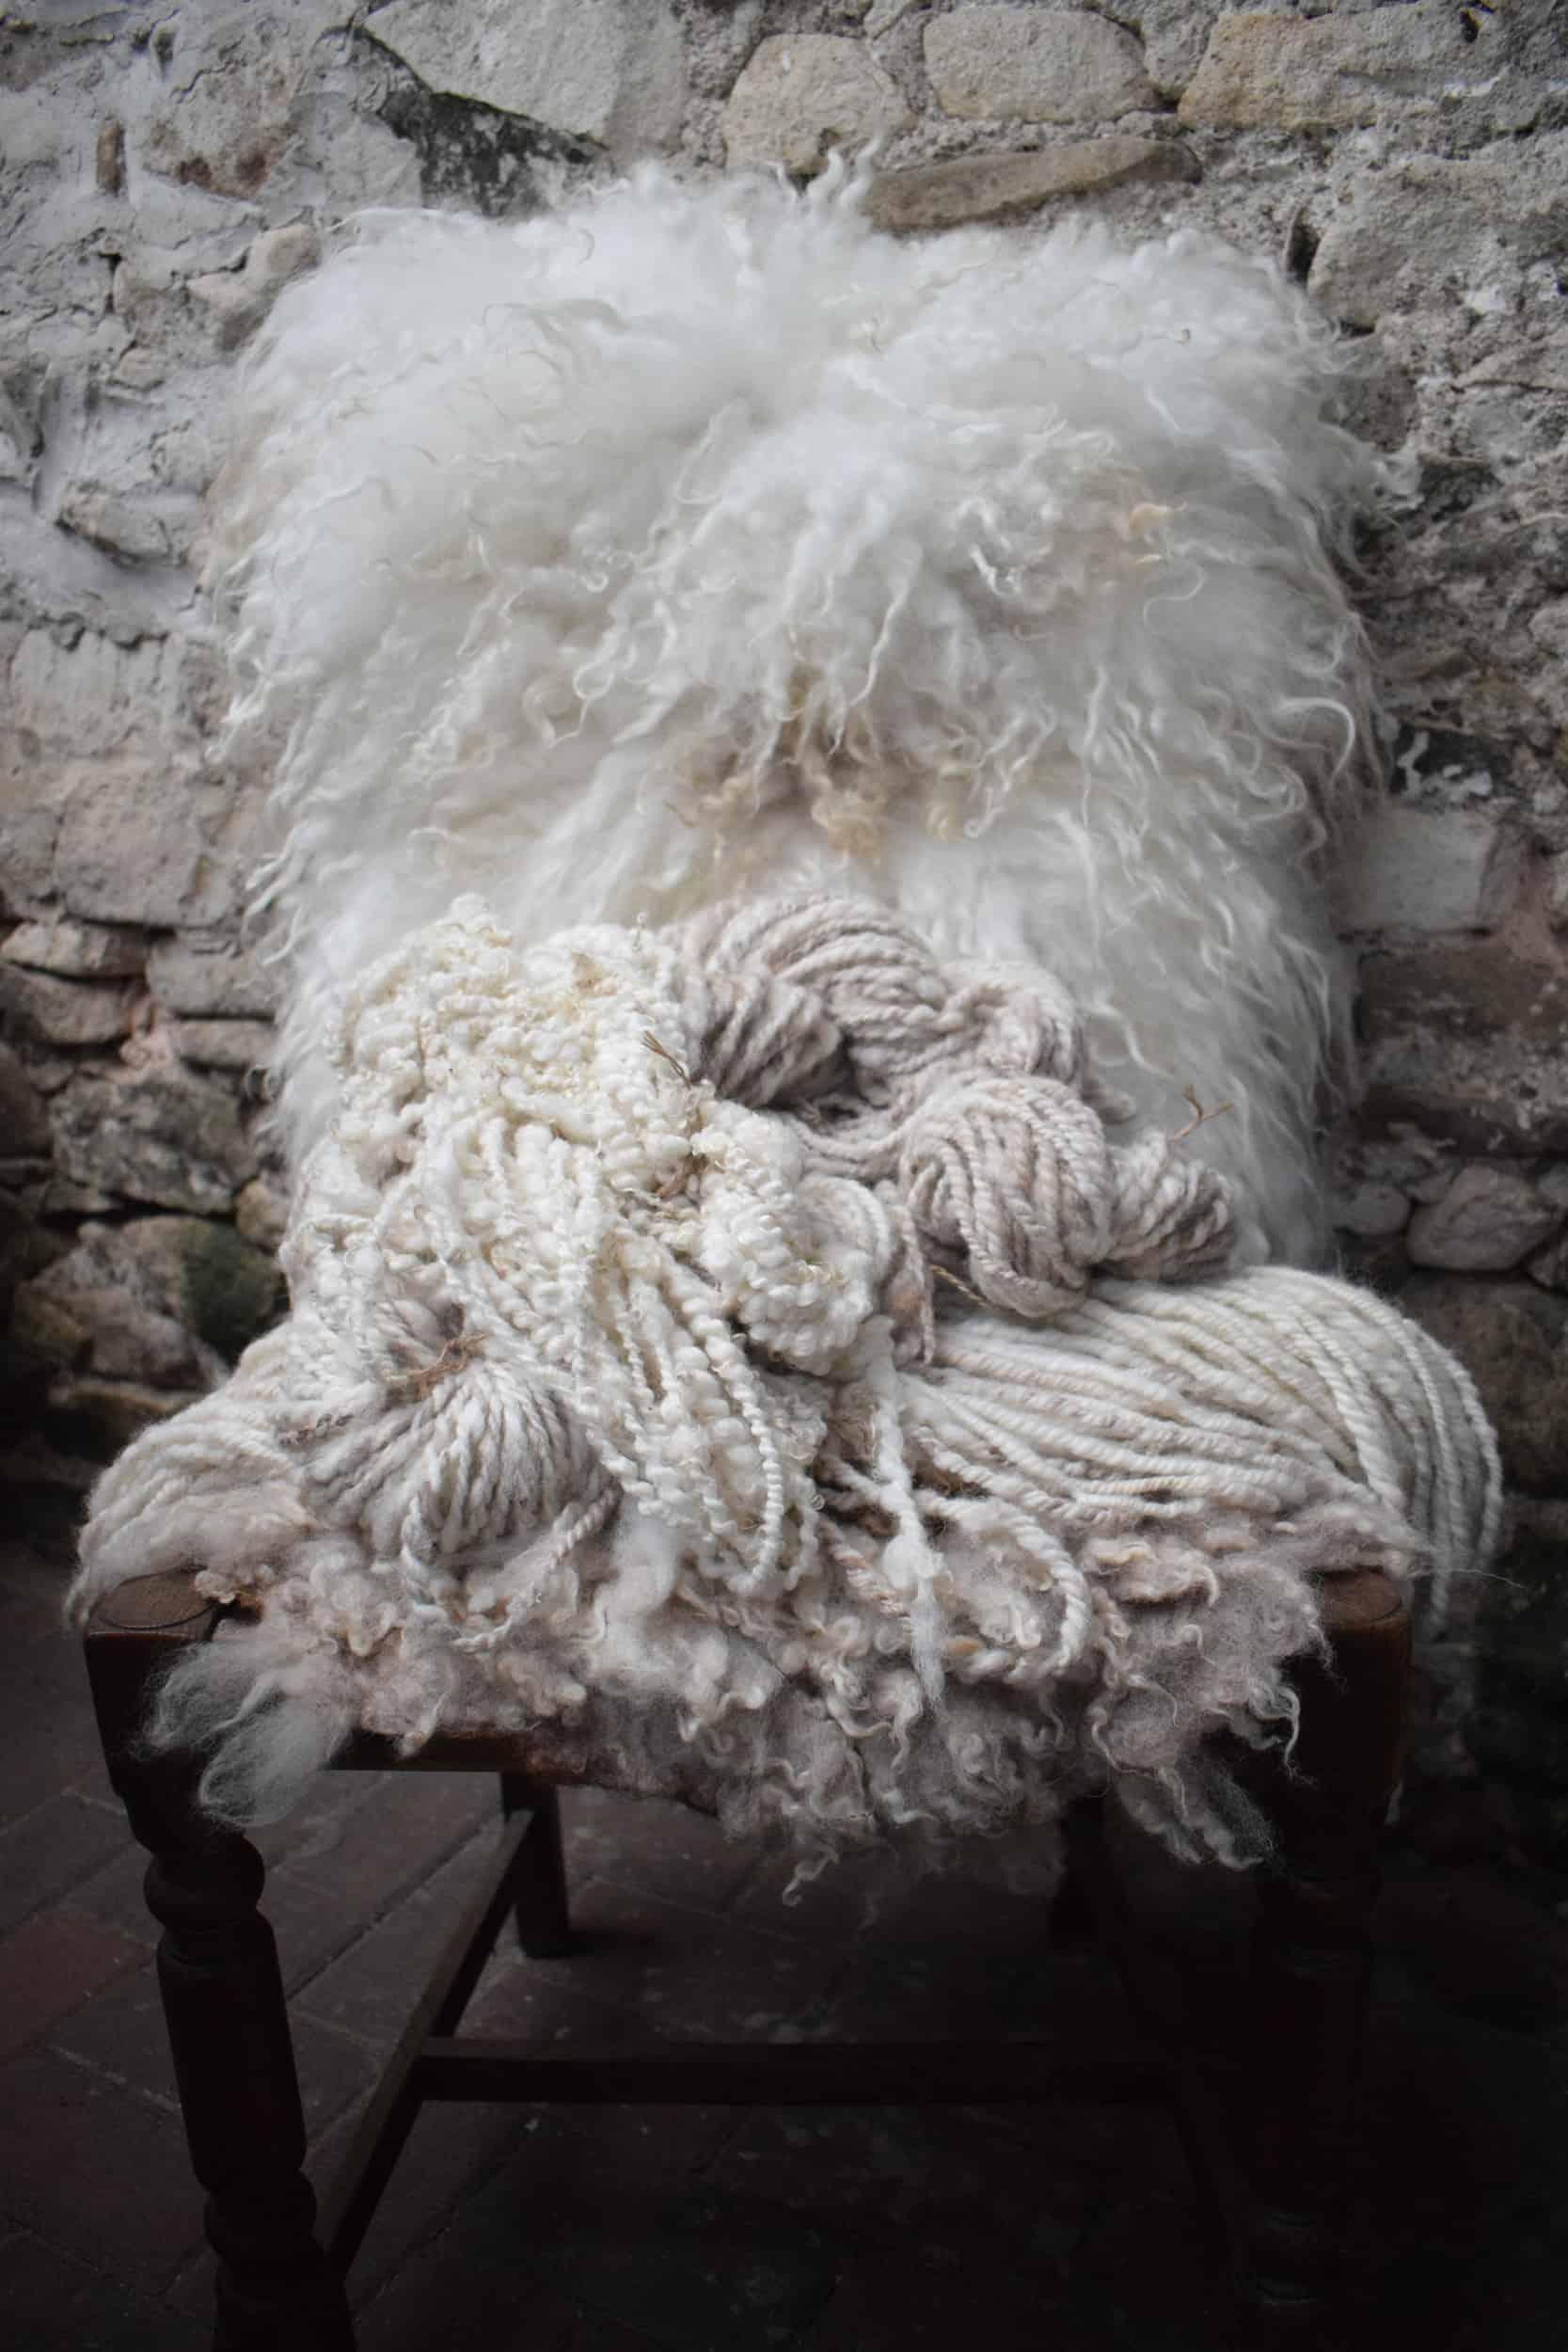 felted fleece handspun wool cushion woven wool vegetarian sheepskin dotty icelandic cross